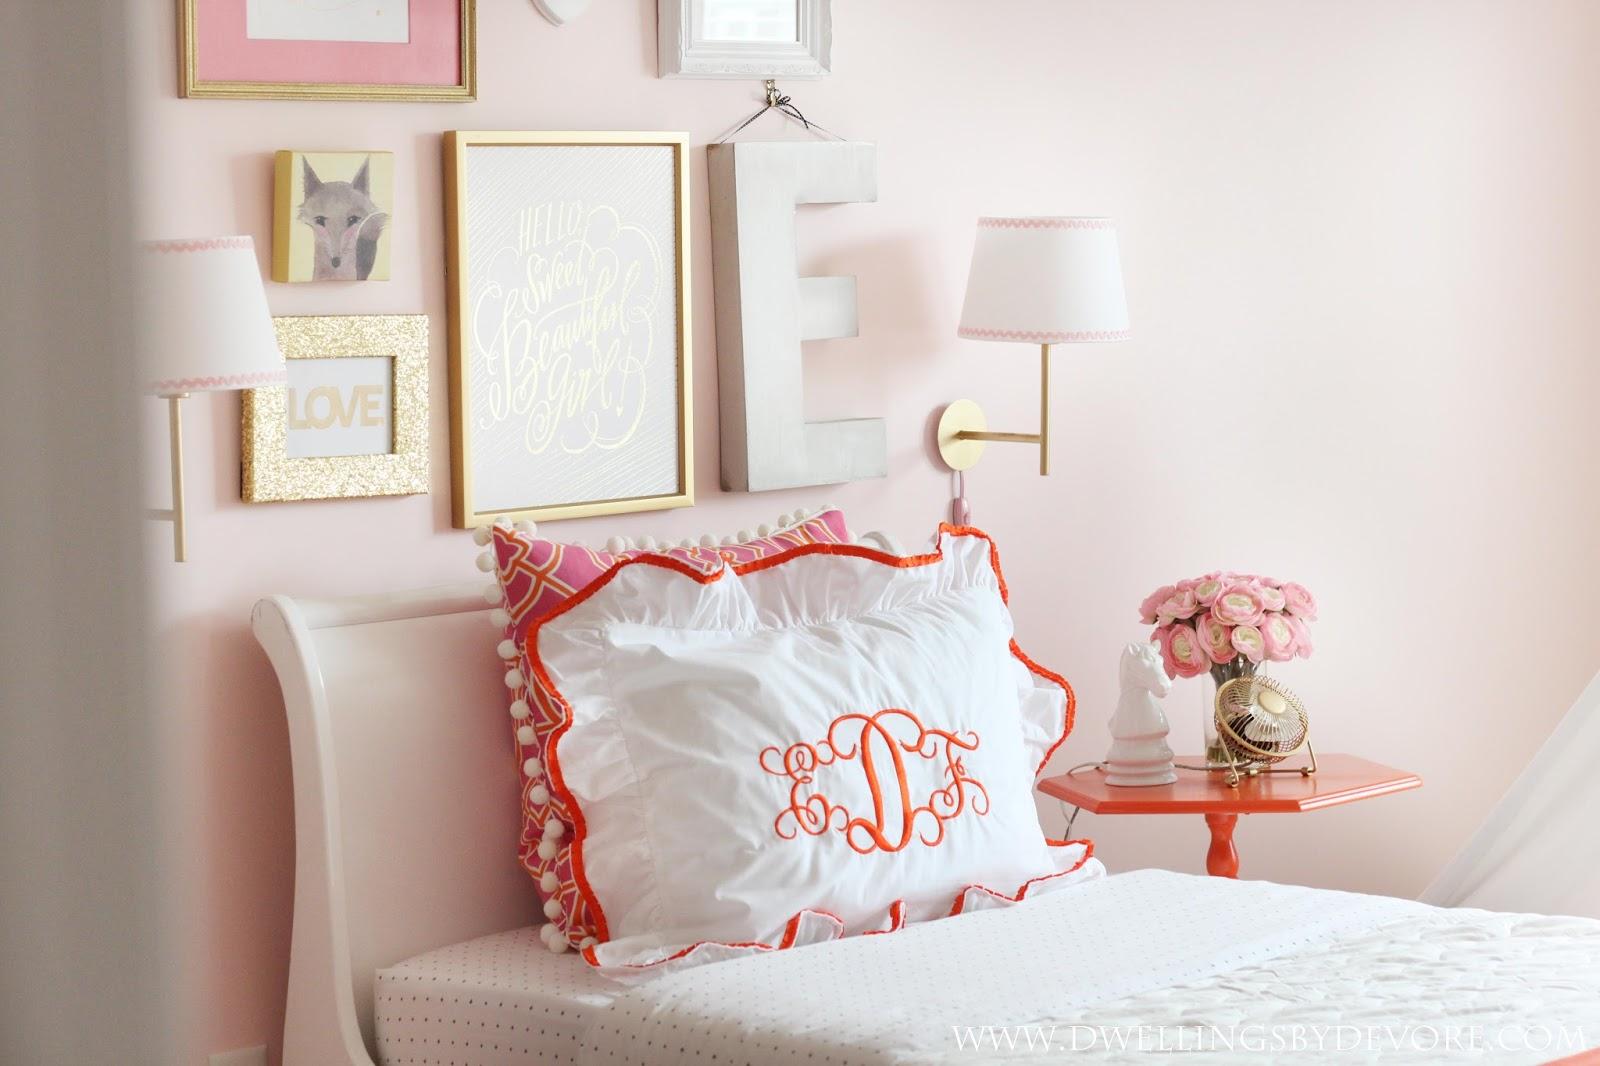 Dwellings By DeVore: DIY monogrammed pillow sham